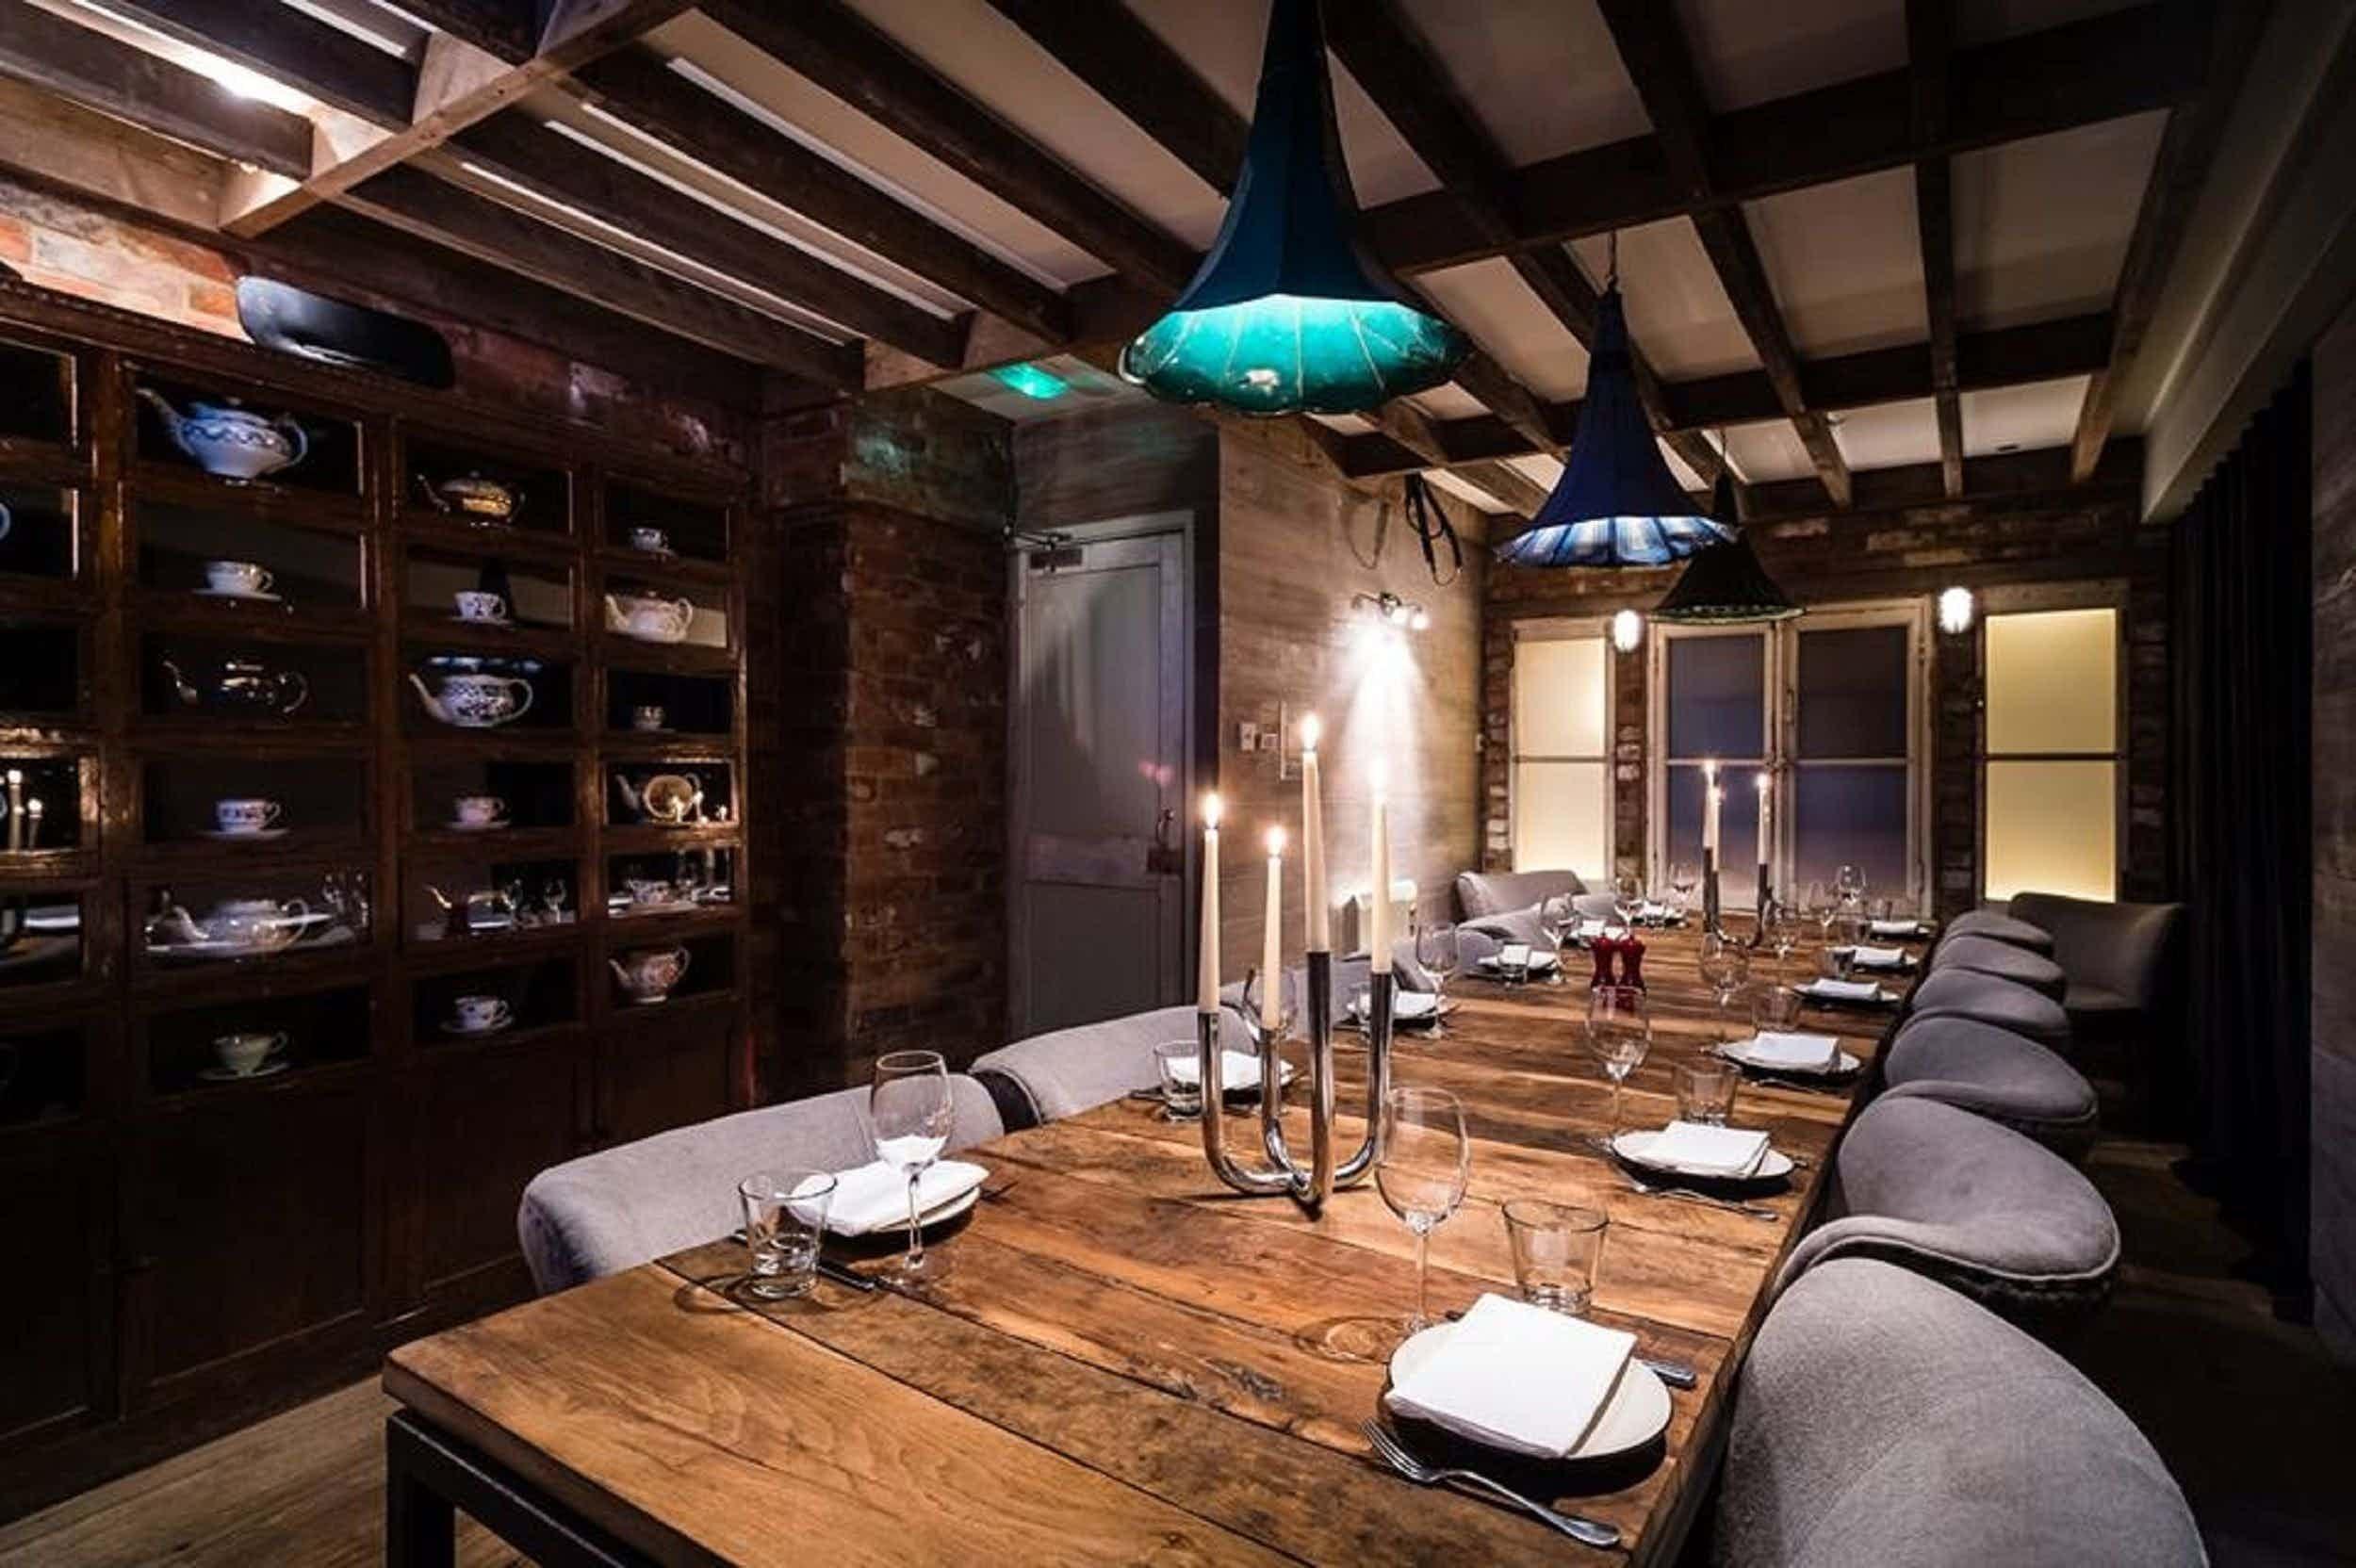 The Little Room, Loyal Tavern